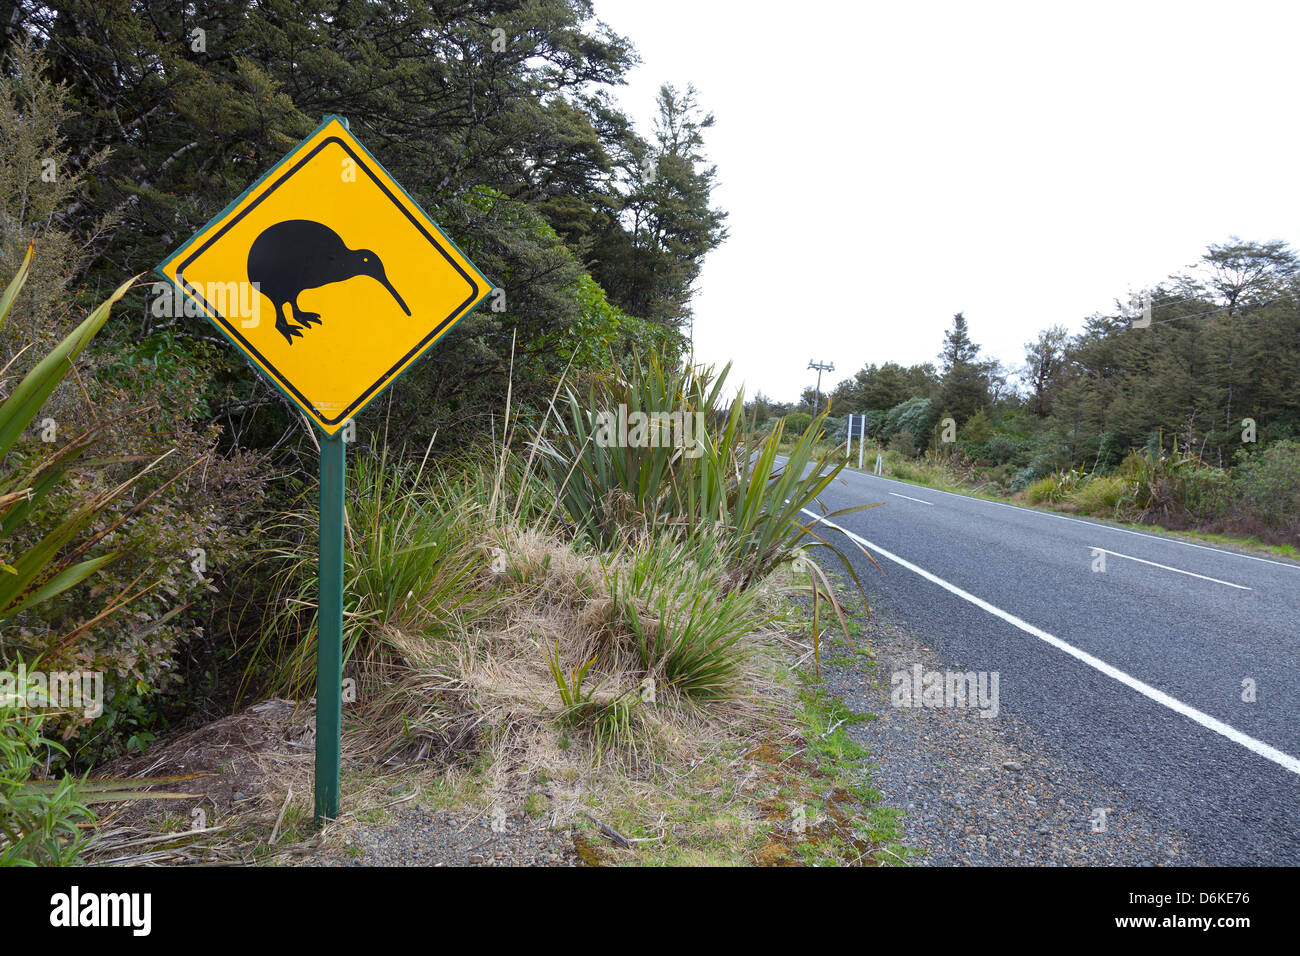 Kiwi sign near the road, Northern Island, New Zealand - Stock Image